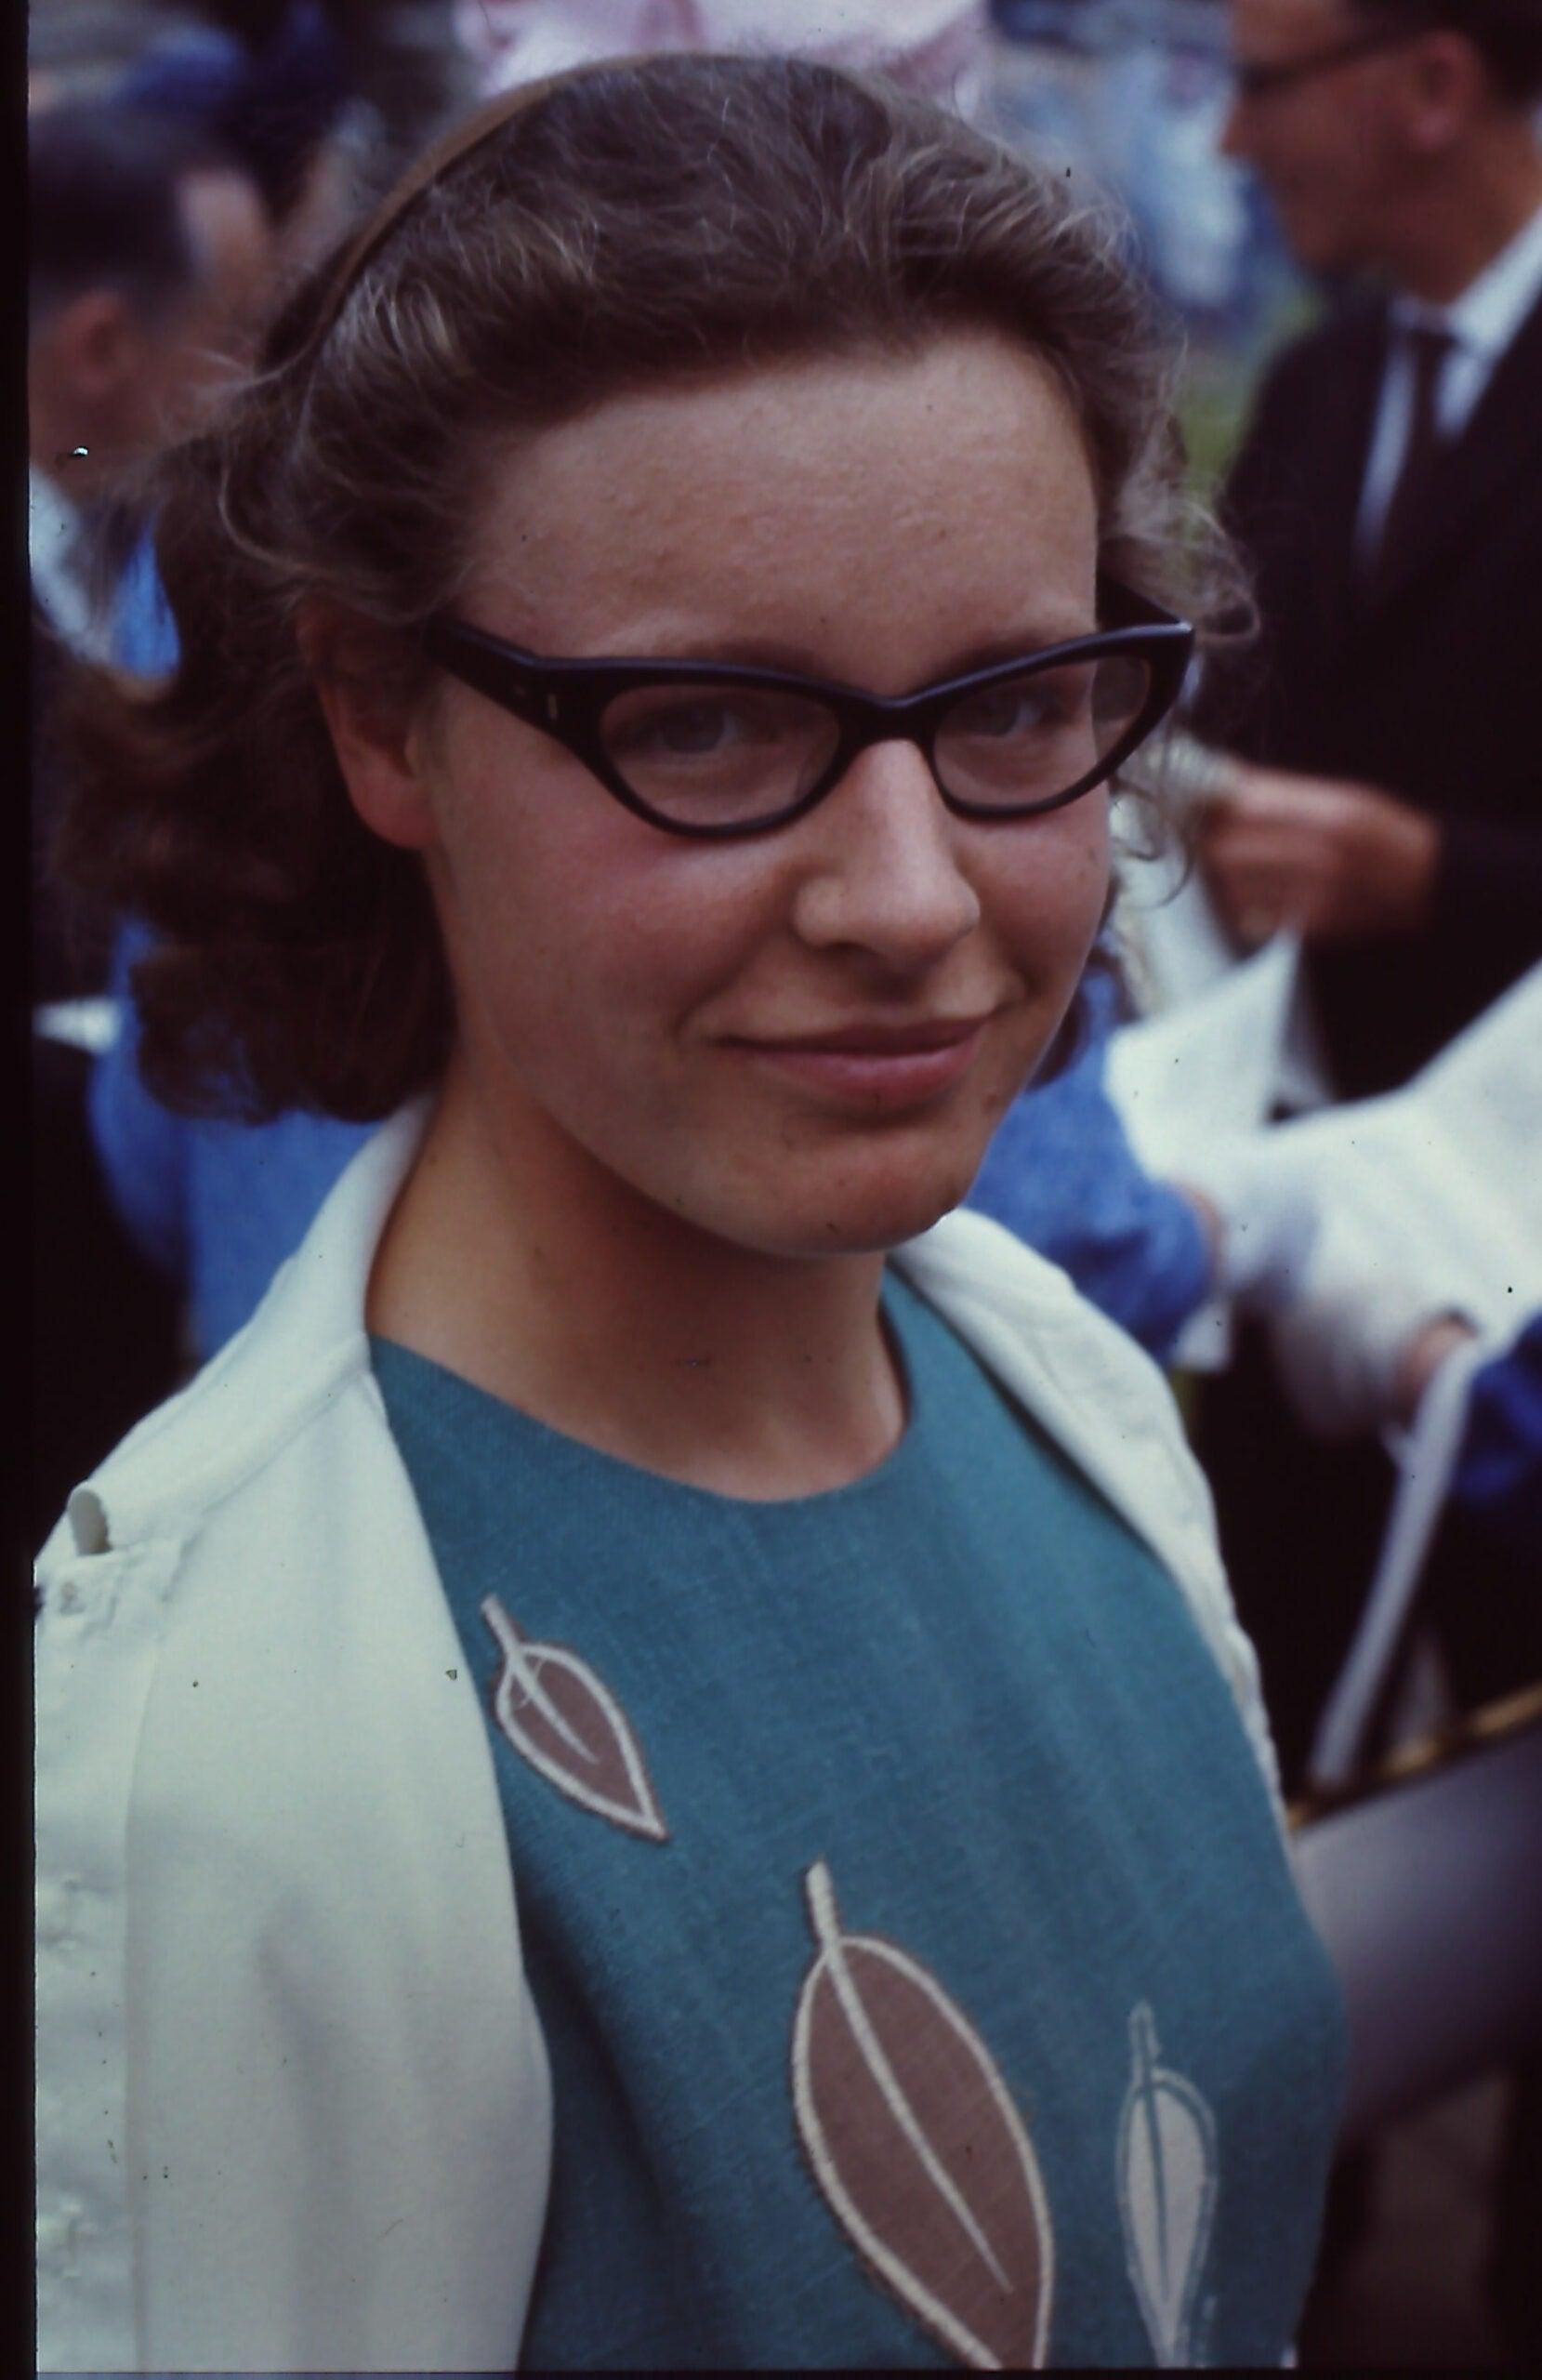 Decades after a Nobel Prize snub, Jocelyn Bell Burnell's just won $3 million for her work